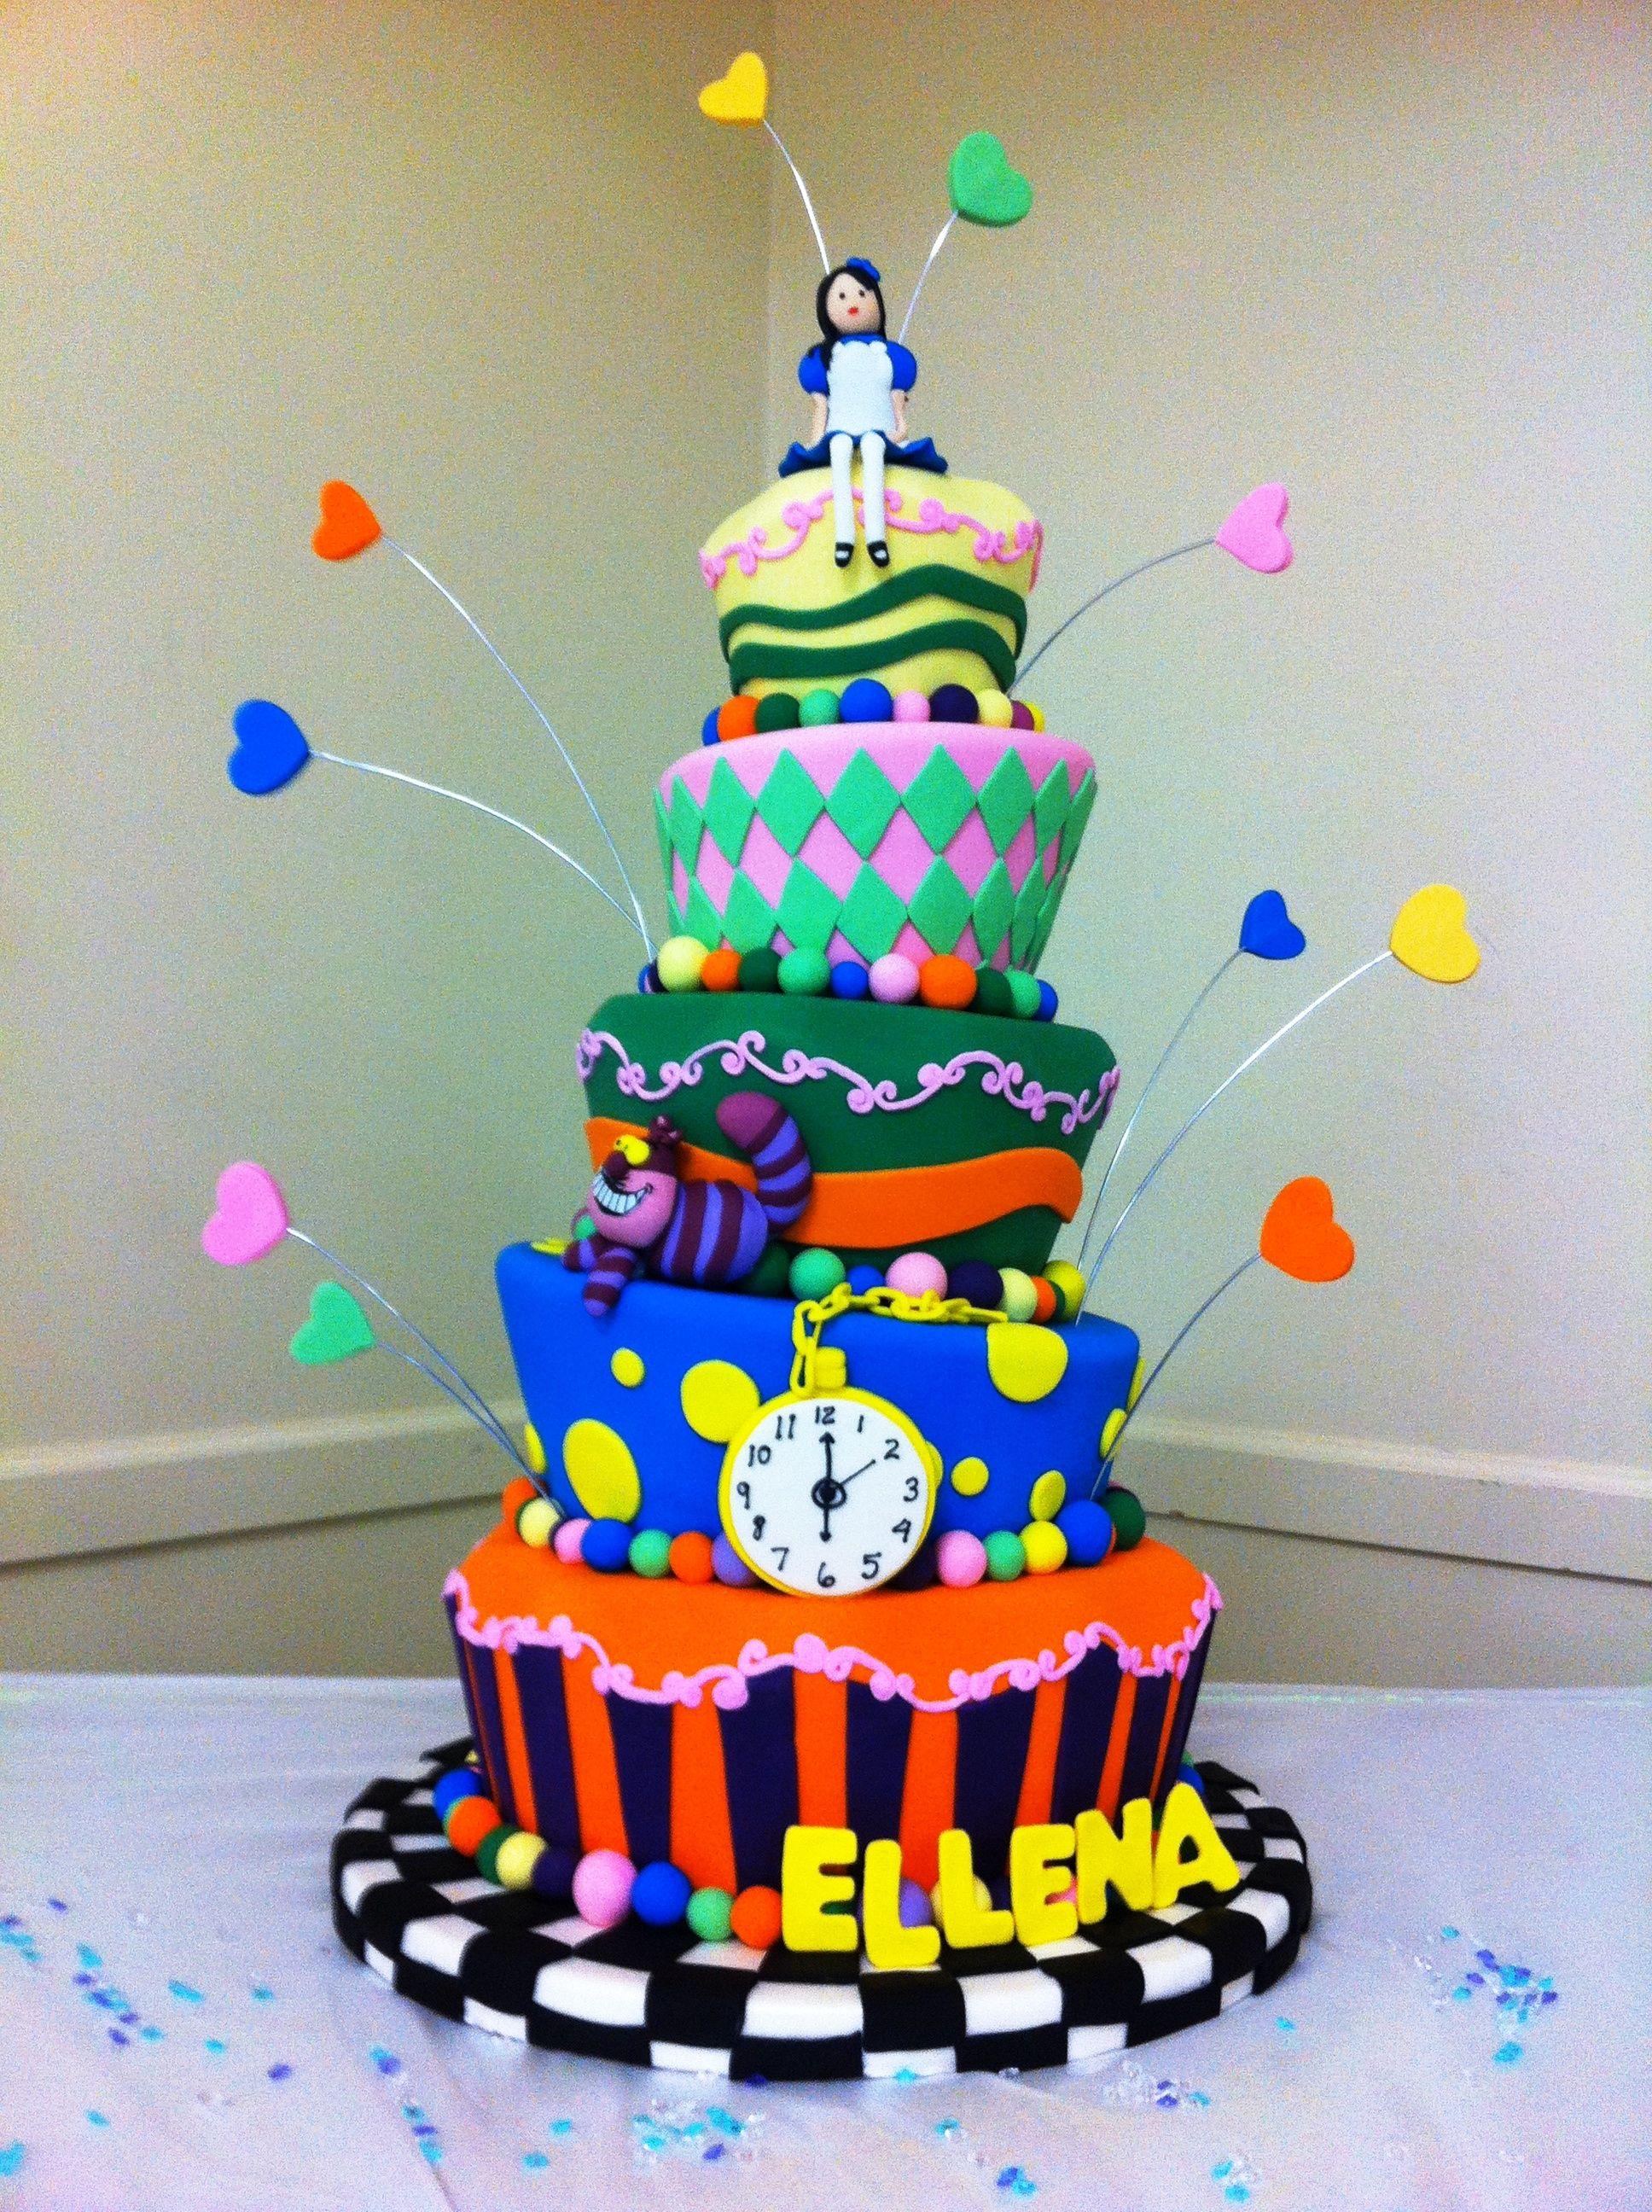 Astounding Alice In Wonderland Mirabella Grand Rapids Mi Amazing Cakes Personalised Birthday Cards Veneteletsinfo